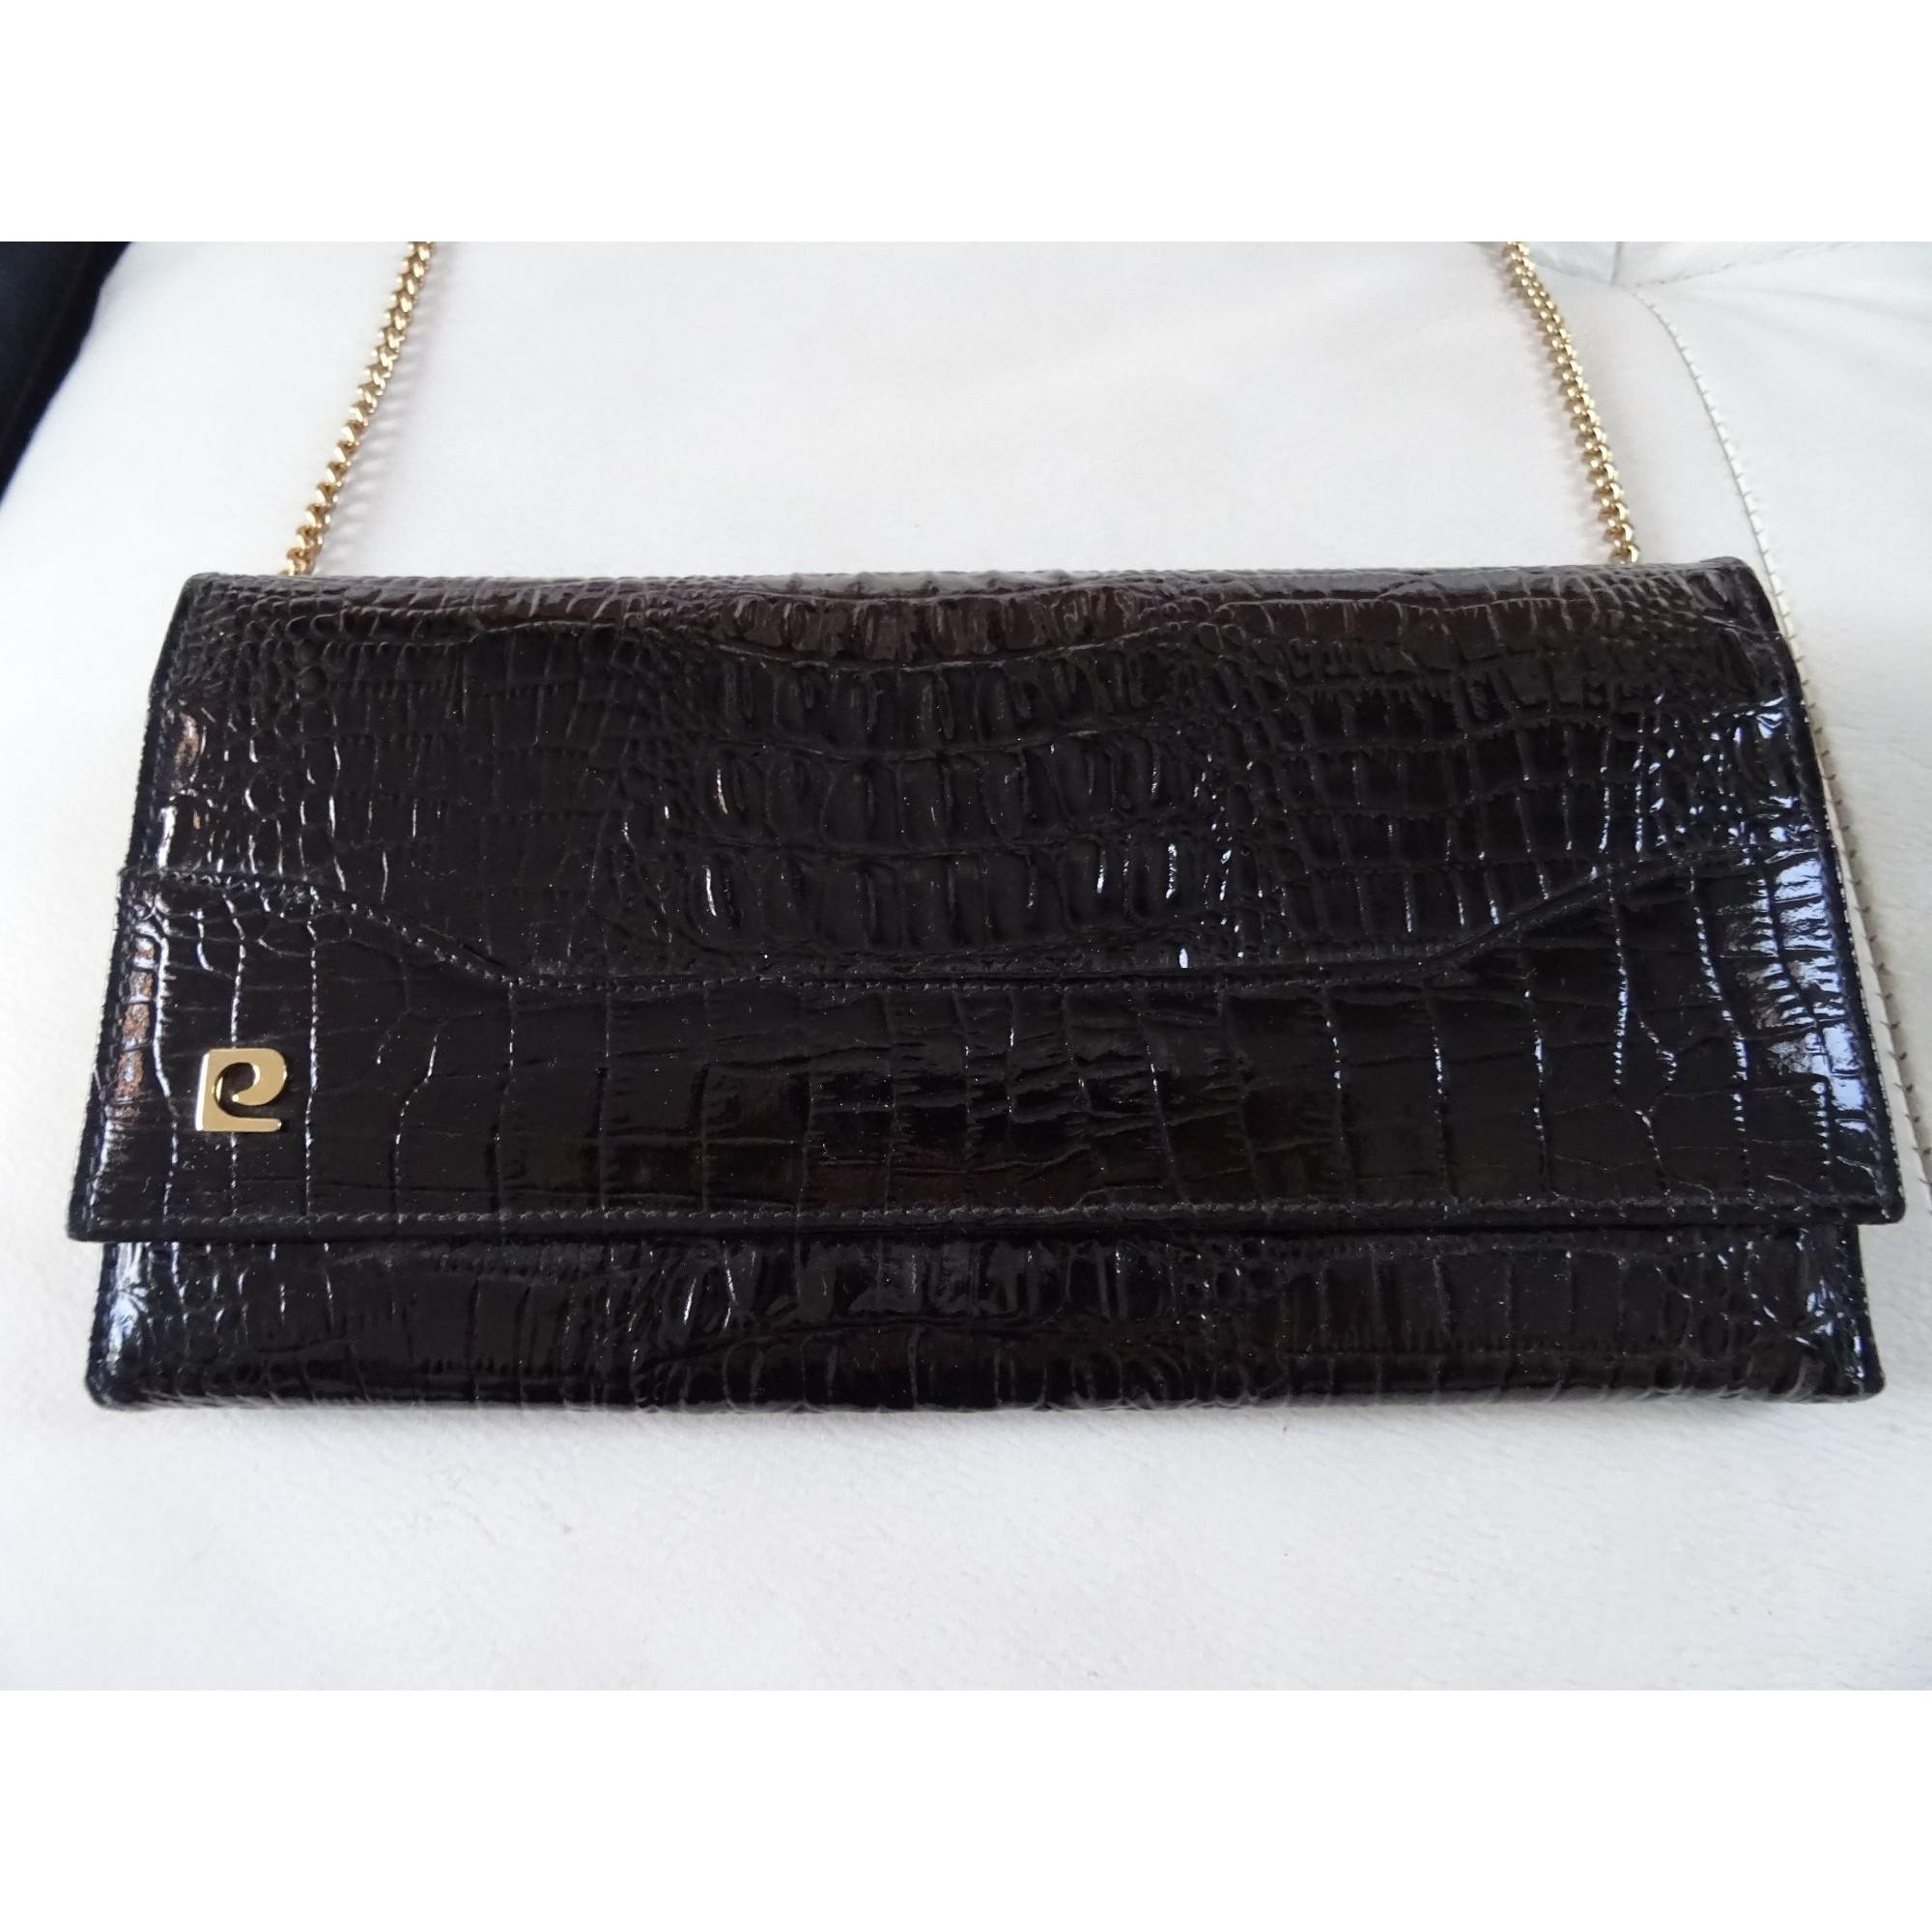 b6846c0c45 Sac pochette en cuir PIERRE CARDIN noir - 7959086